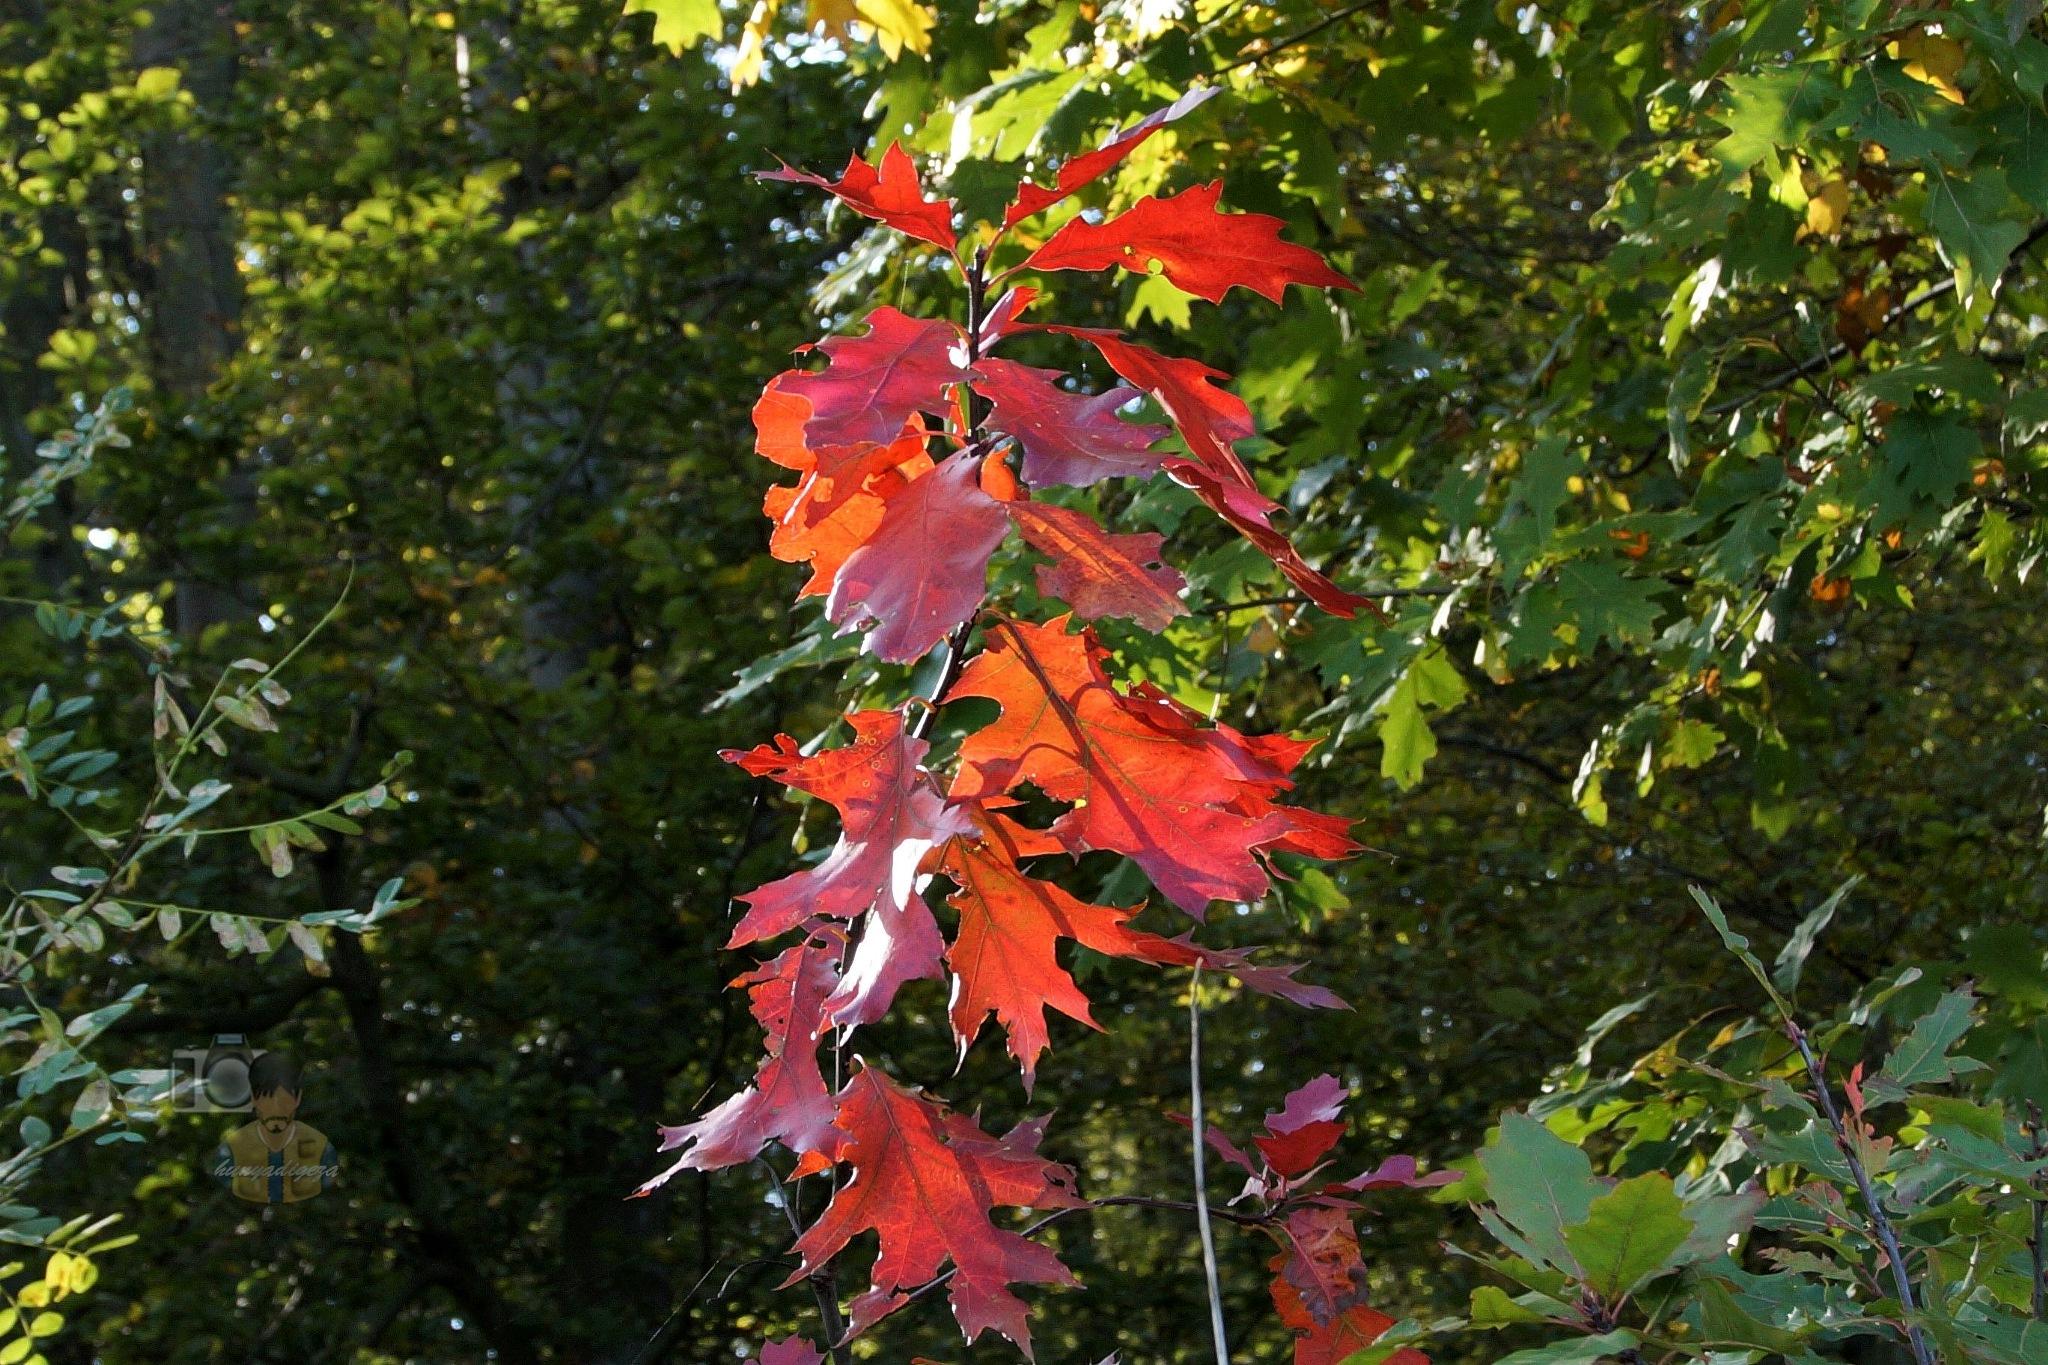 Oct.11, autumn leafs #1 by hunyadigeza